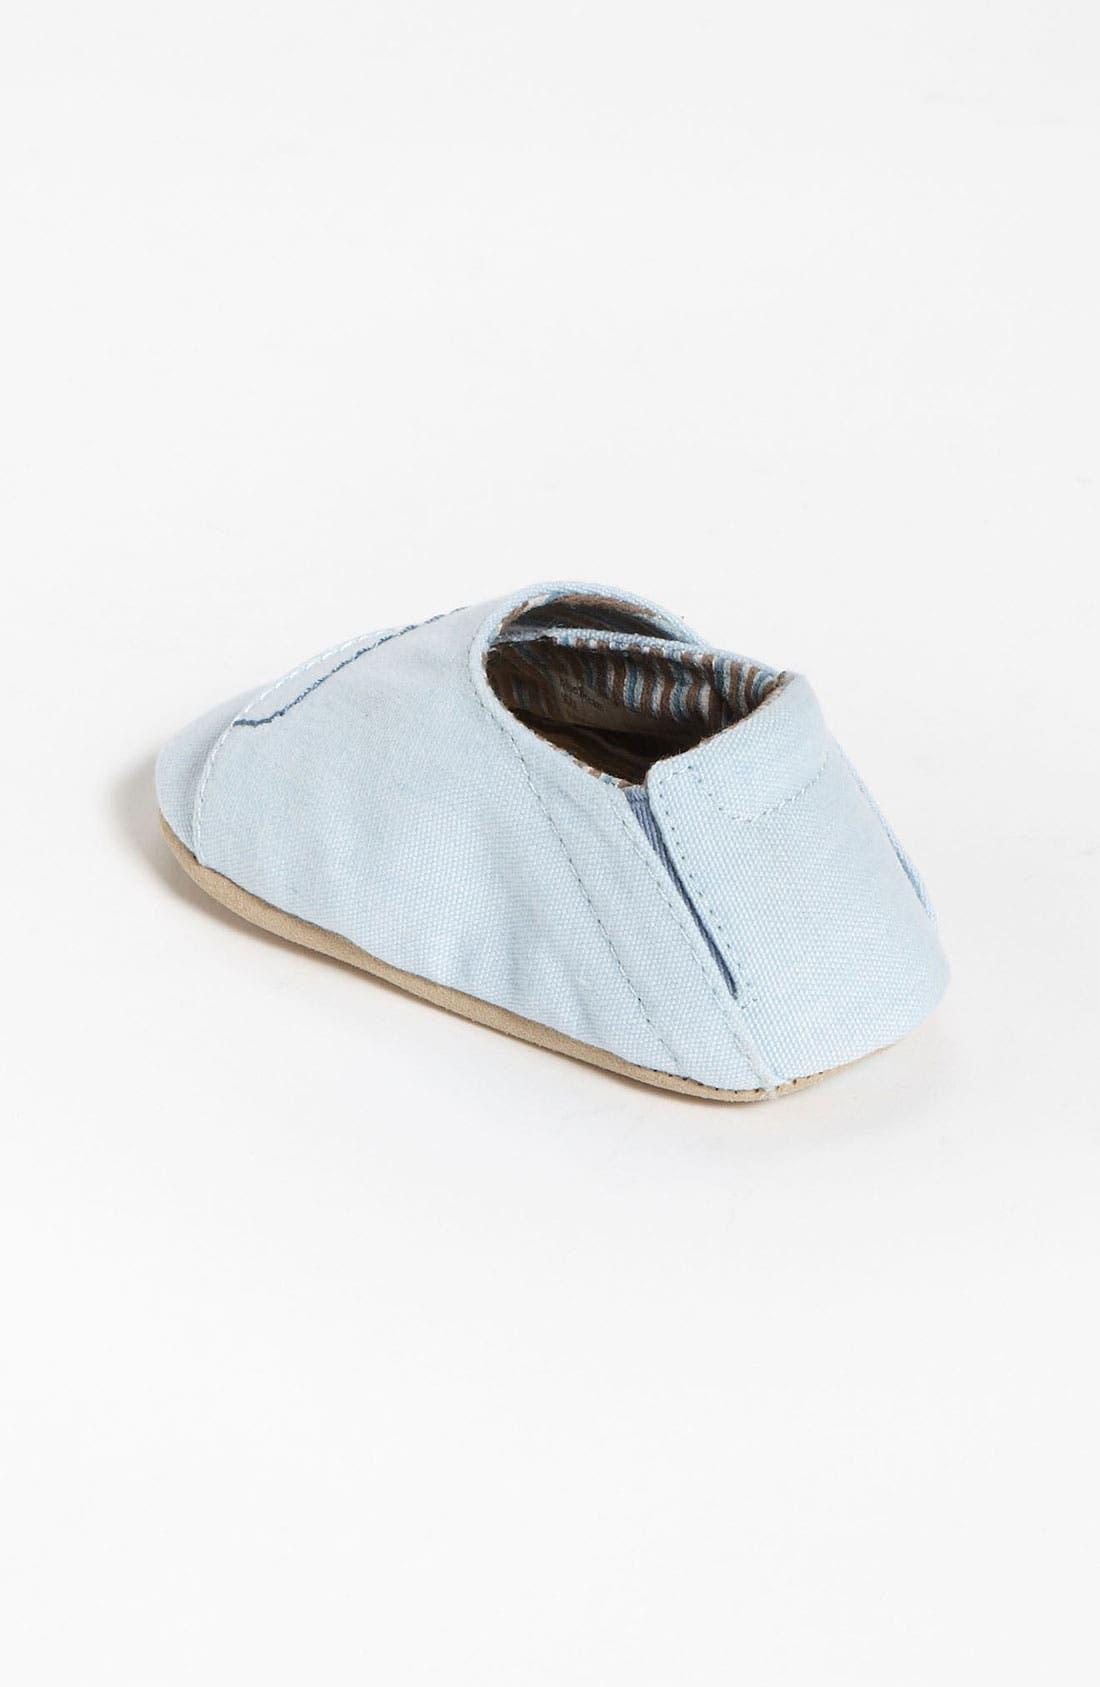 Alternate Image 2  - Stride Rite 'Blue Dream' Crib Shoe (Baby)